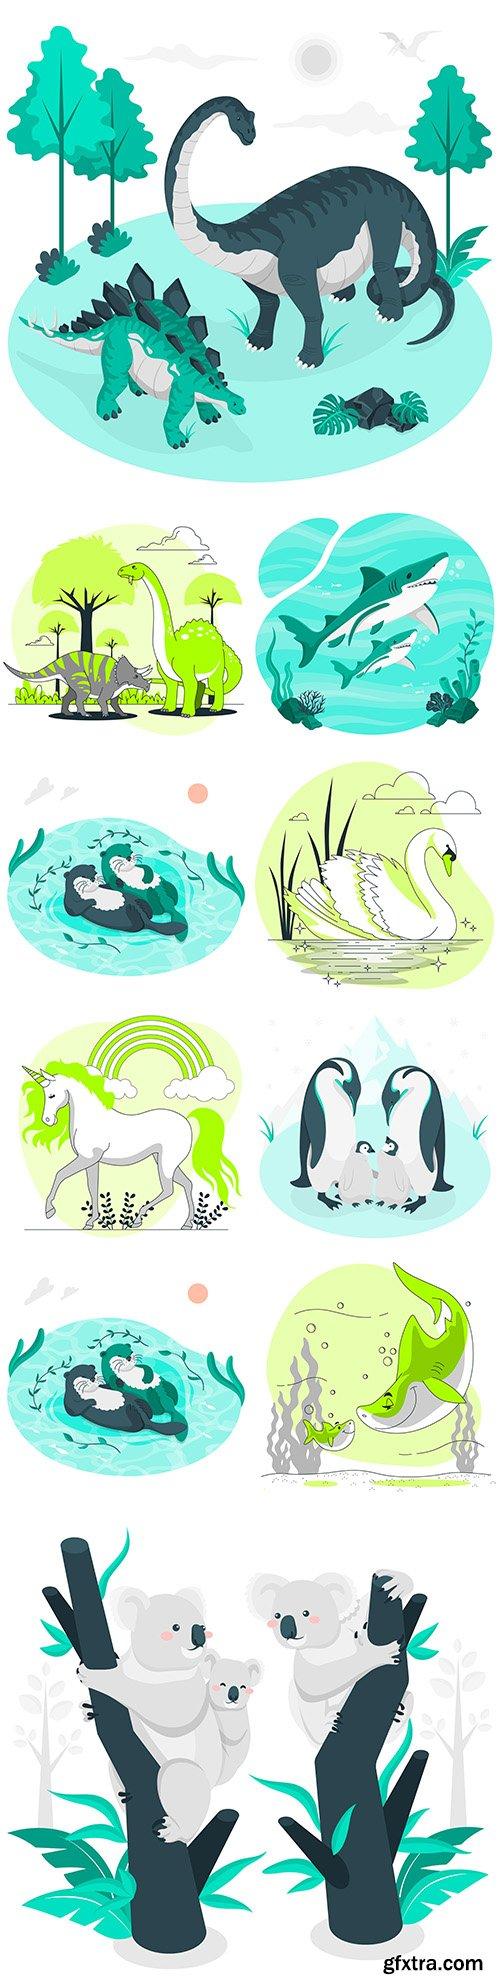 Animal and marine dwellers hand-drawn illustrations